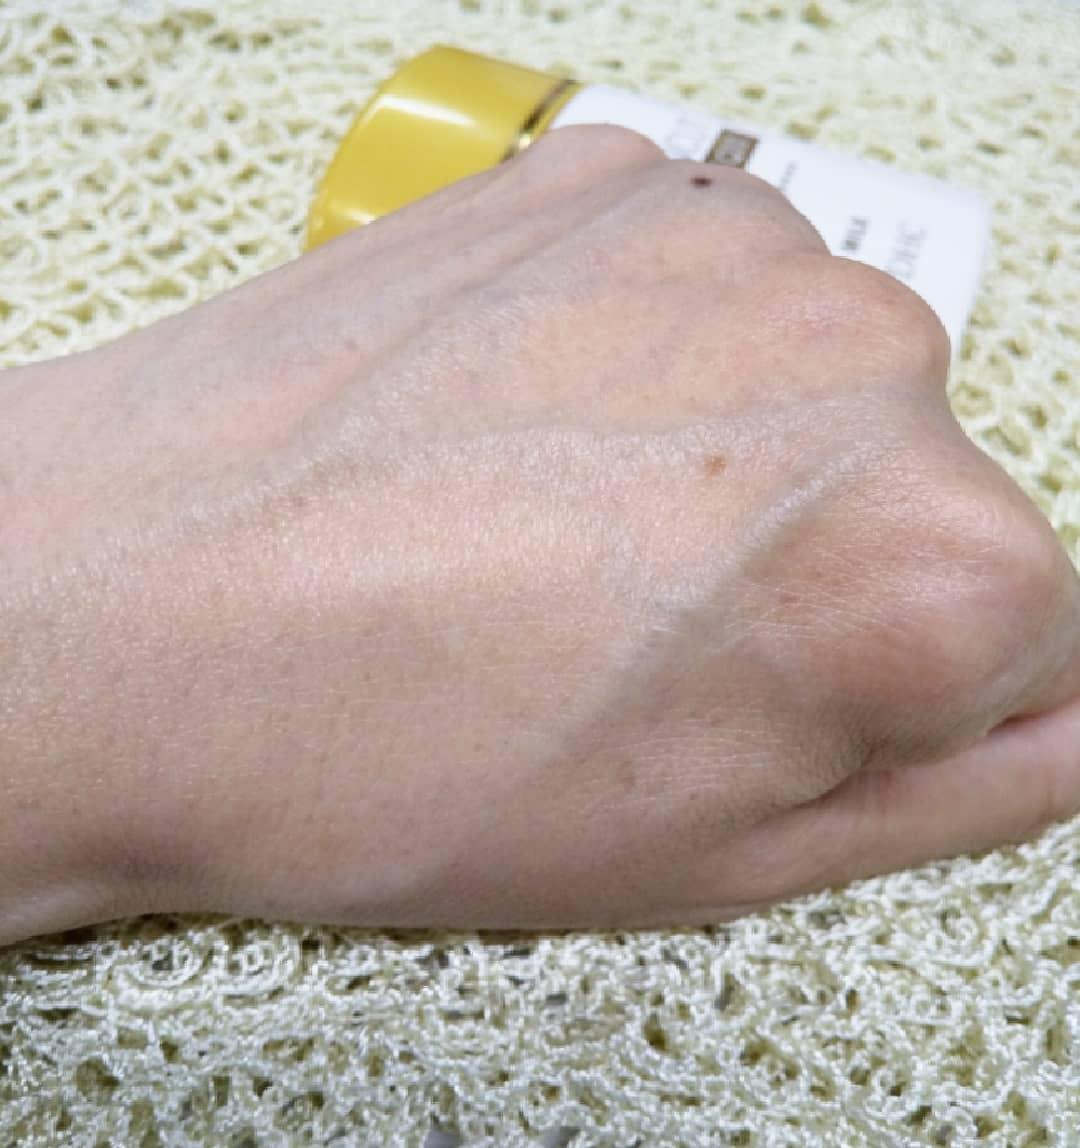 DHC(ディーエイチシー) サンカットQ10 パーフェクトミルクを使ったカサブランカさんのクチコミ画像3